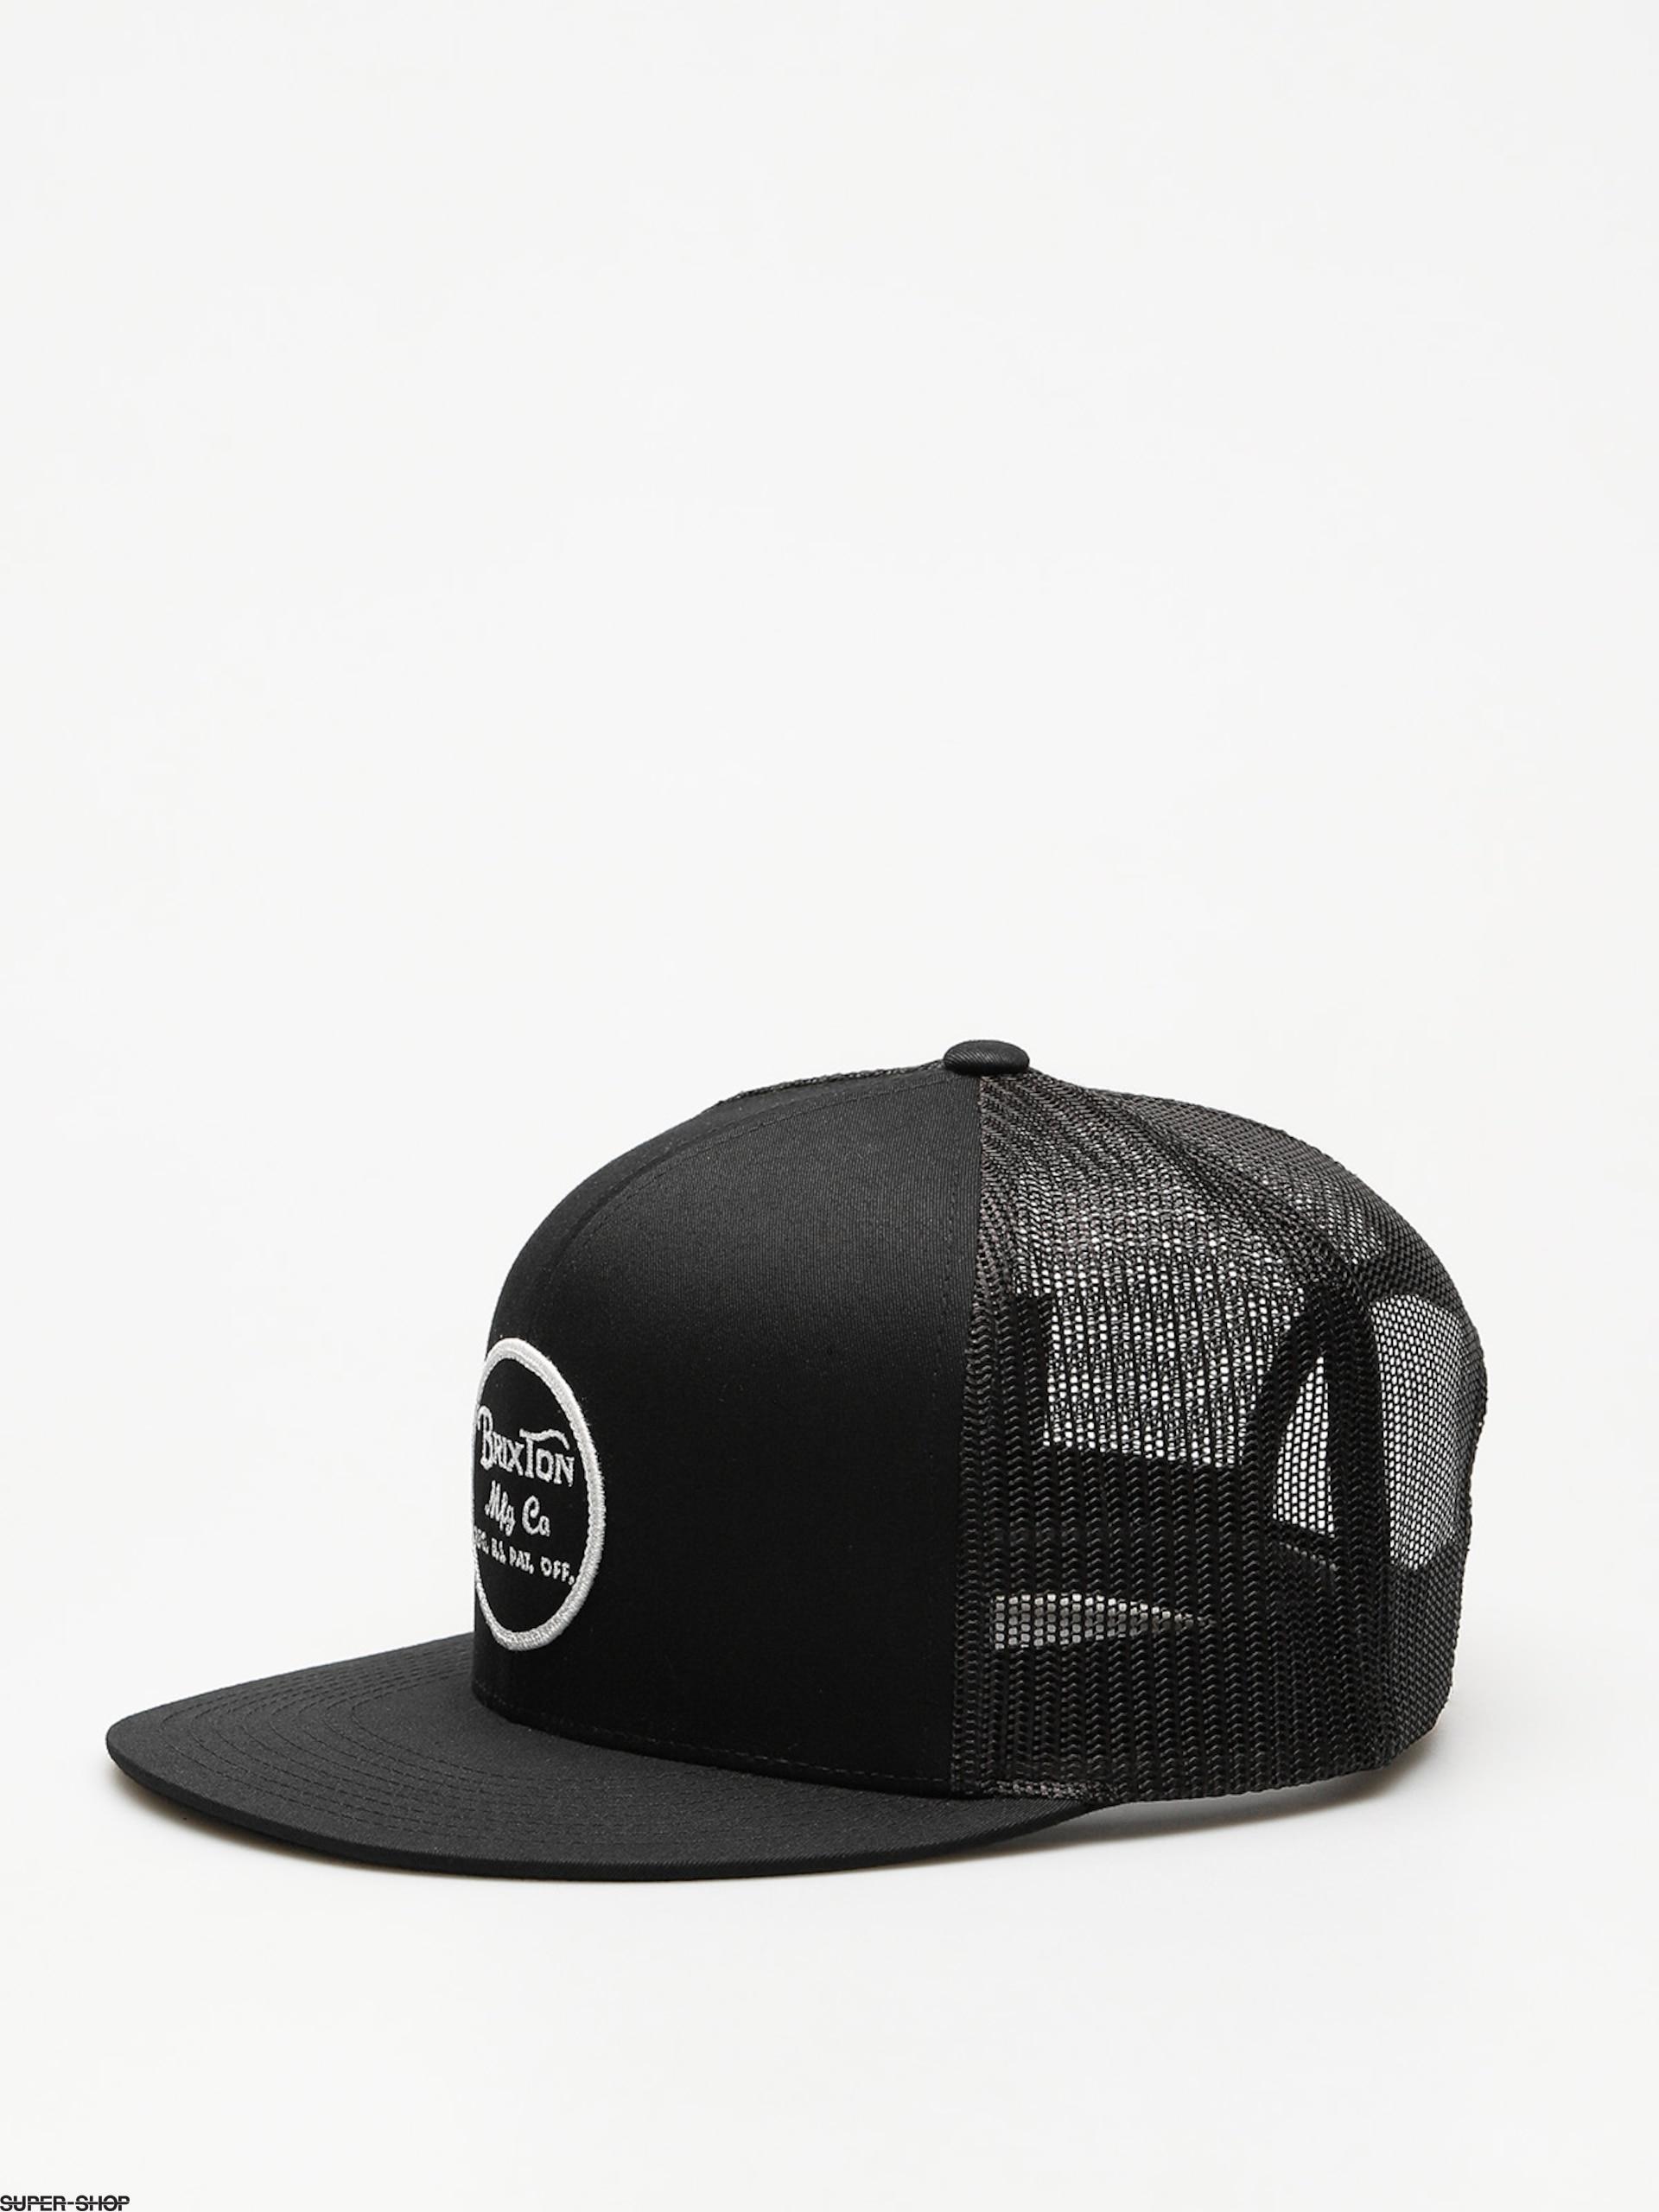 c3a8a064889 932212-w1920-brixton-cap-wheeler-mesh-zd-black-black.jpg